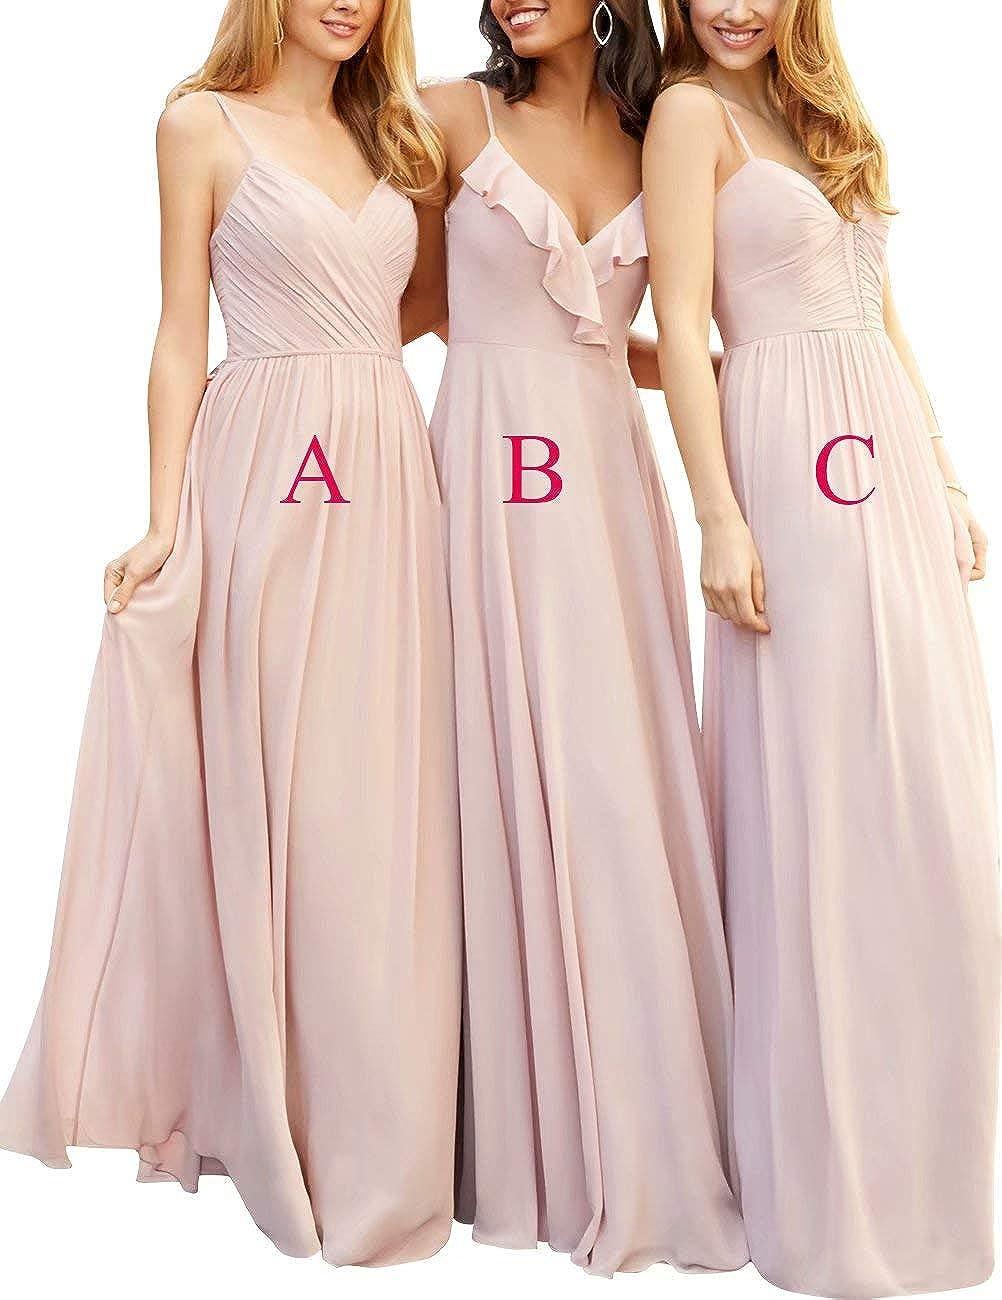 NaXY Womens Chiffon Long Formal Wedding Bridesmaid Dresses Plus Size Burgundy